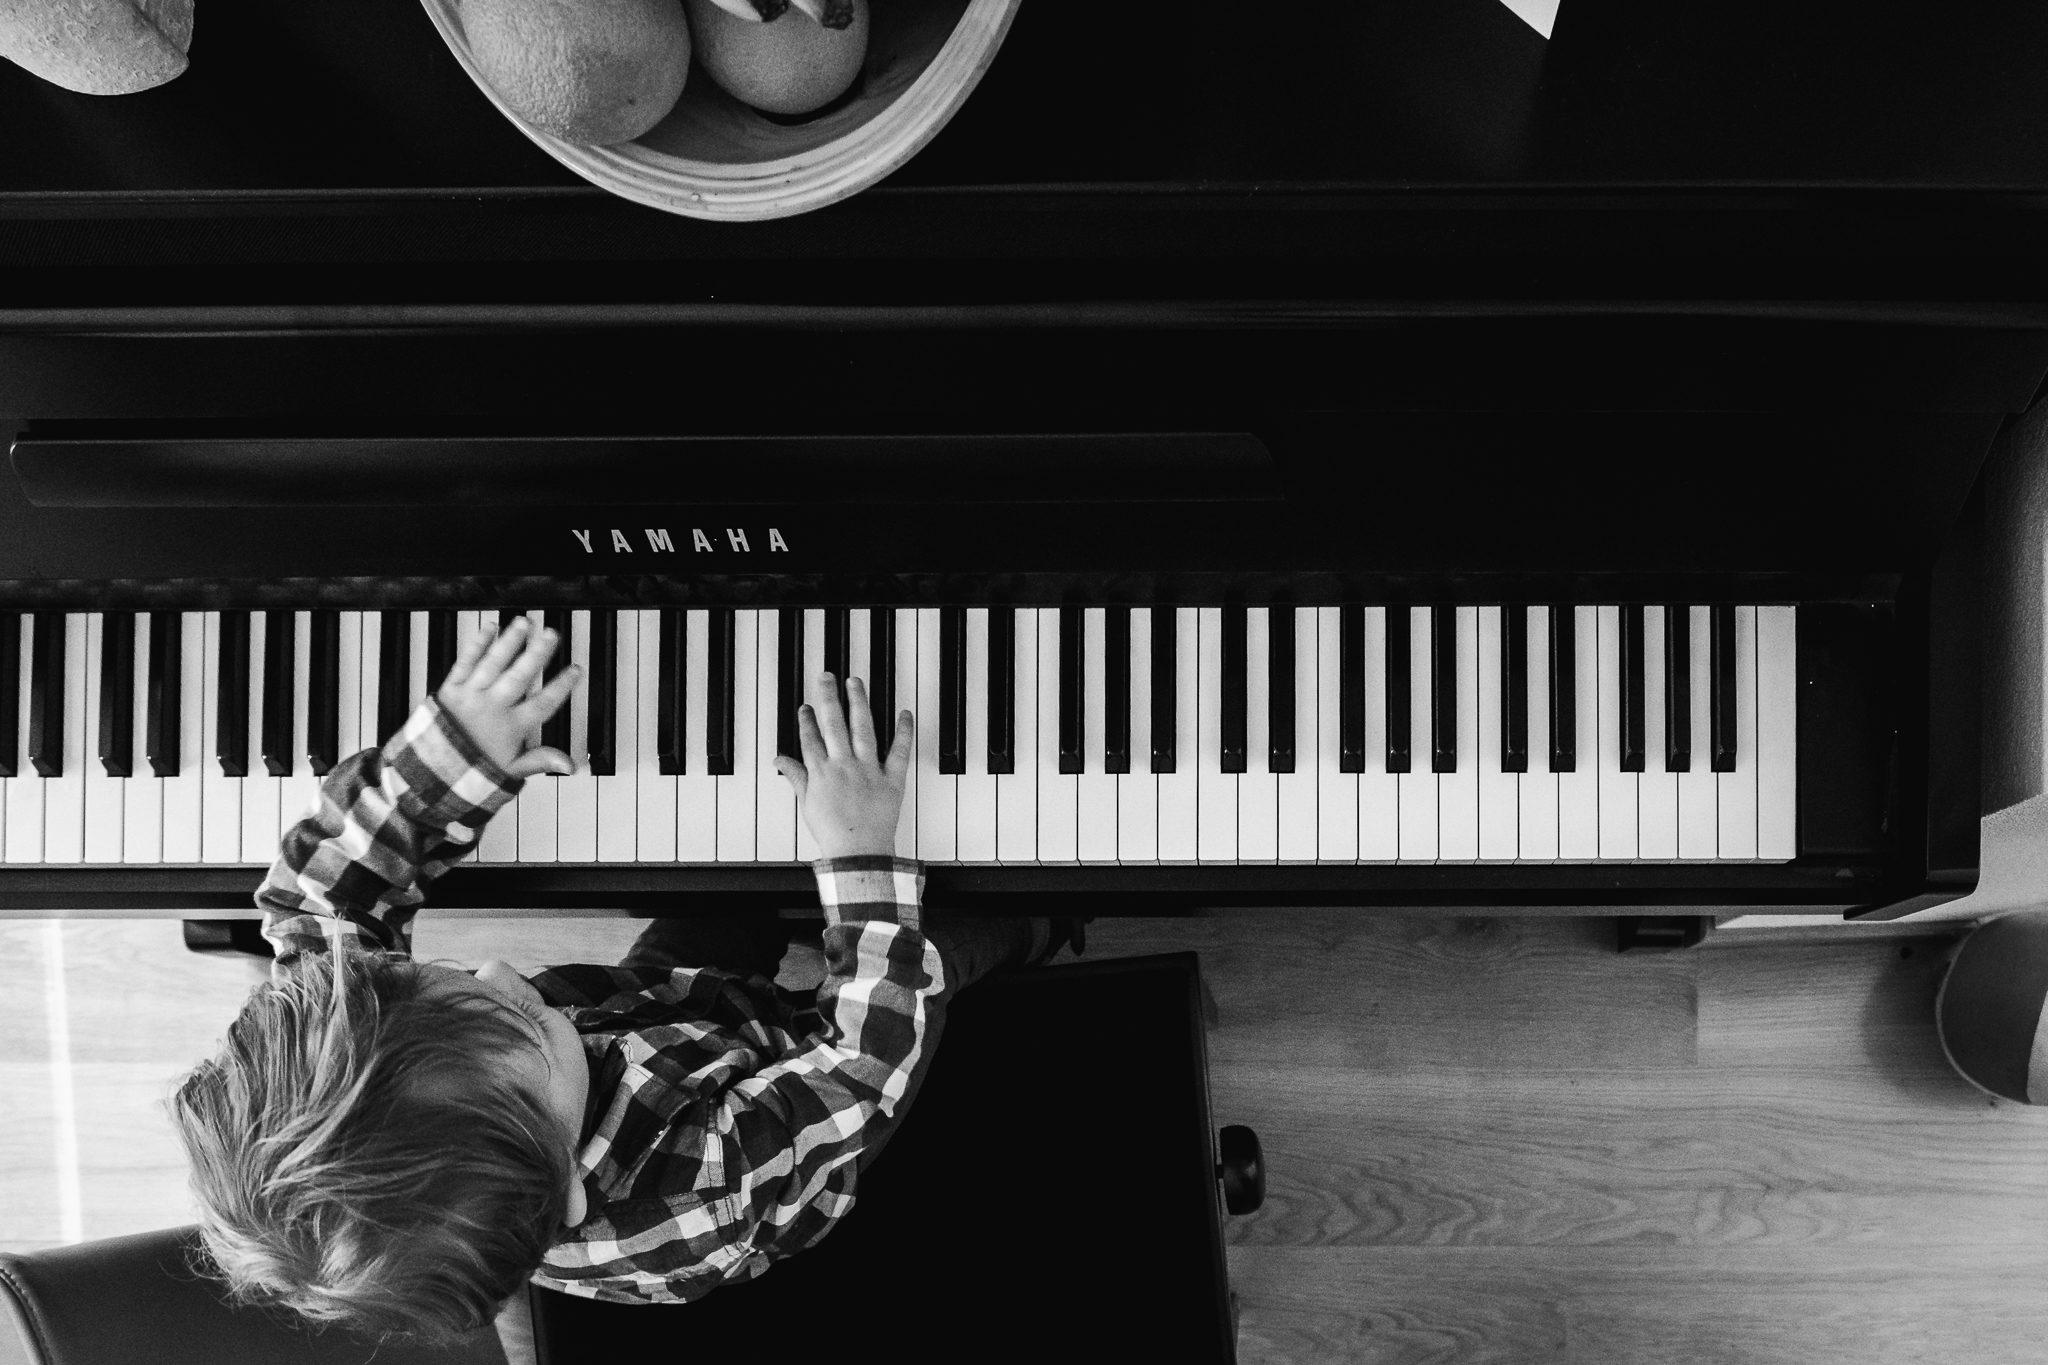 Jongetje speelt op de piano